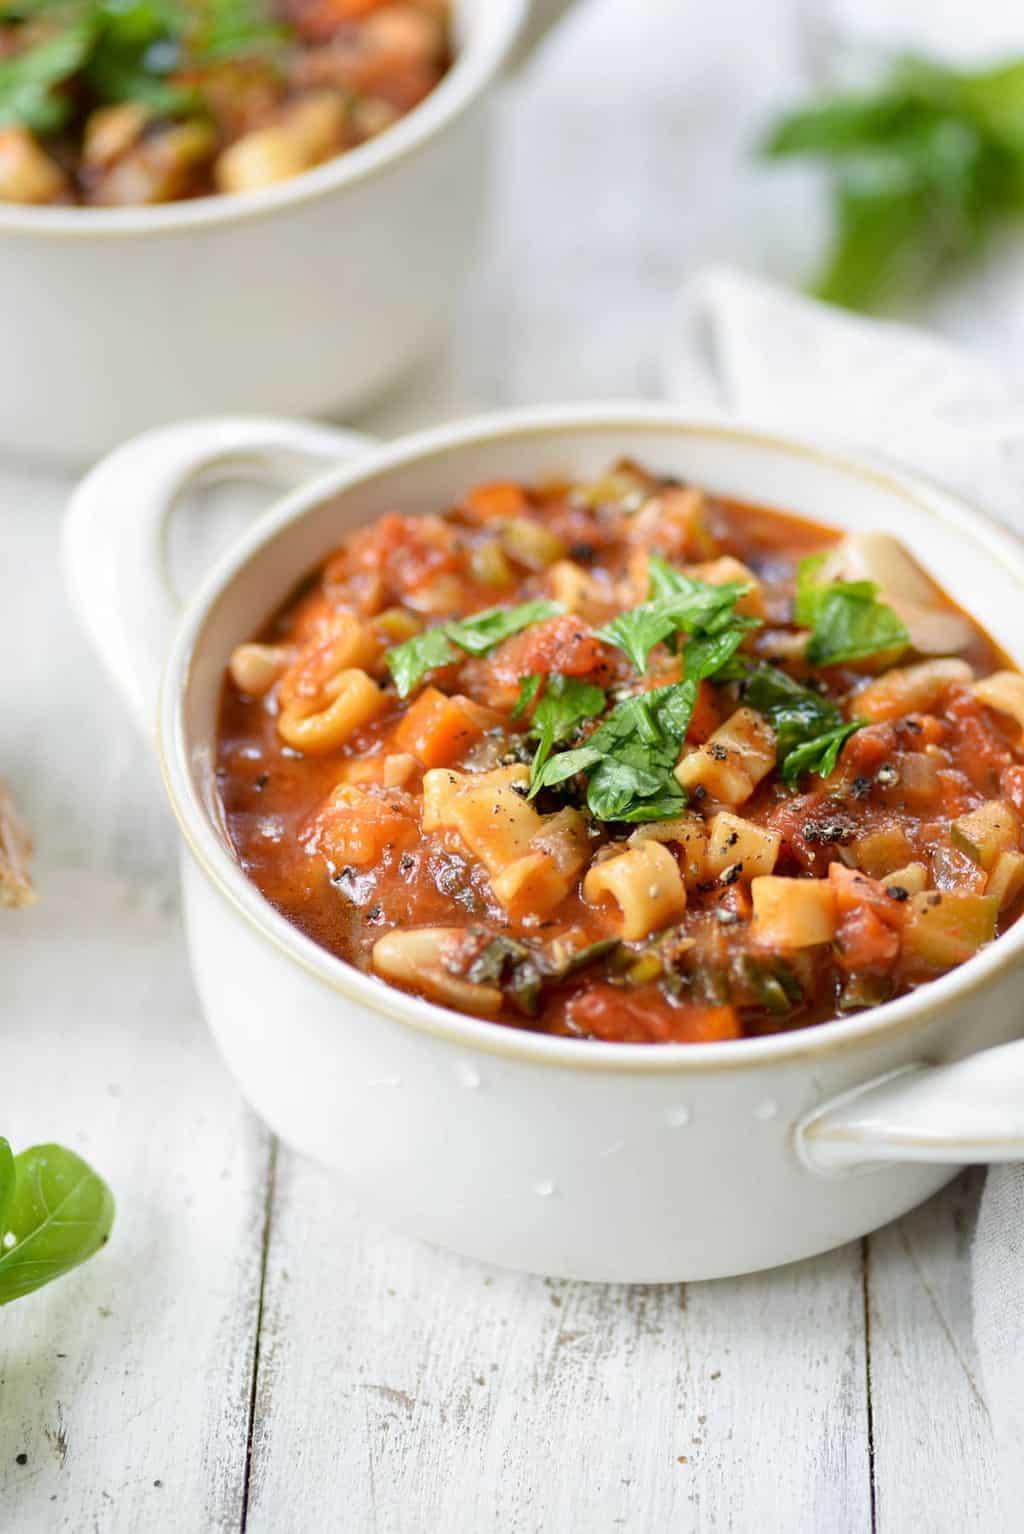 recipe for Instant Pot soup